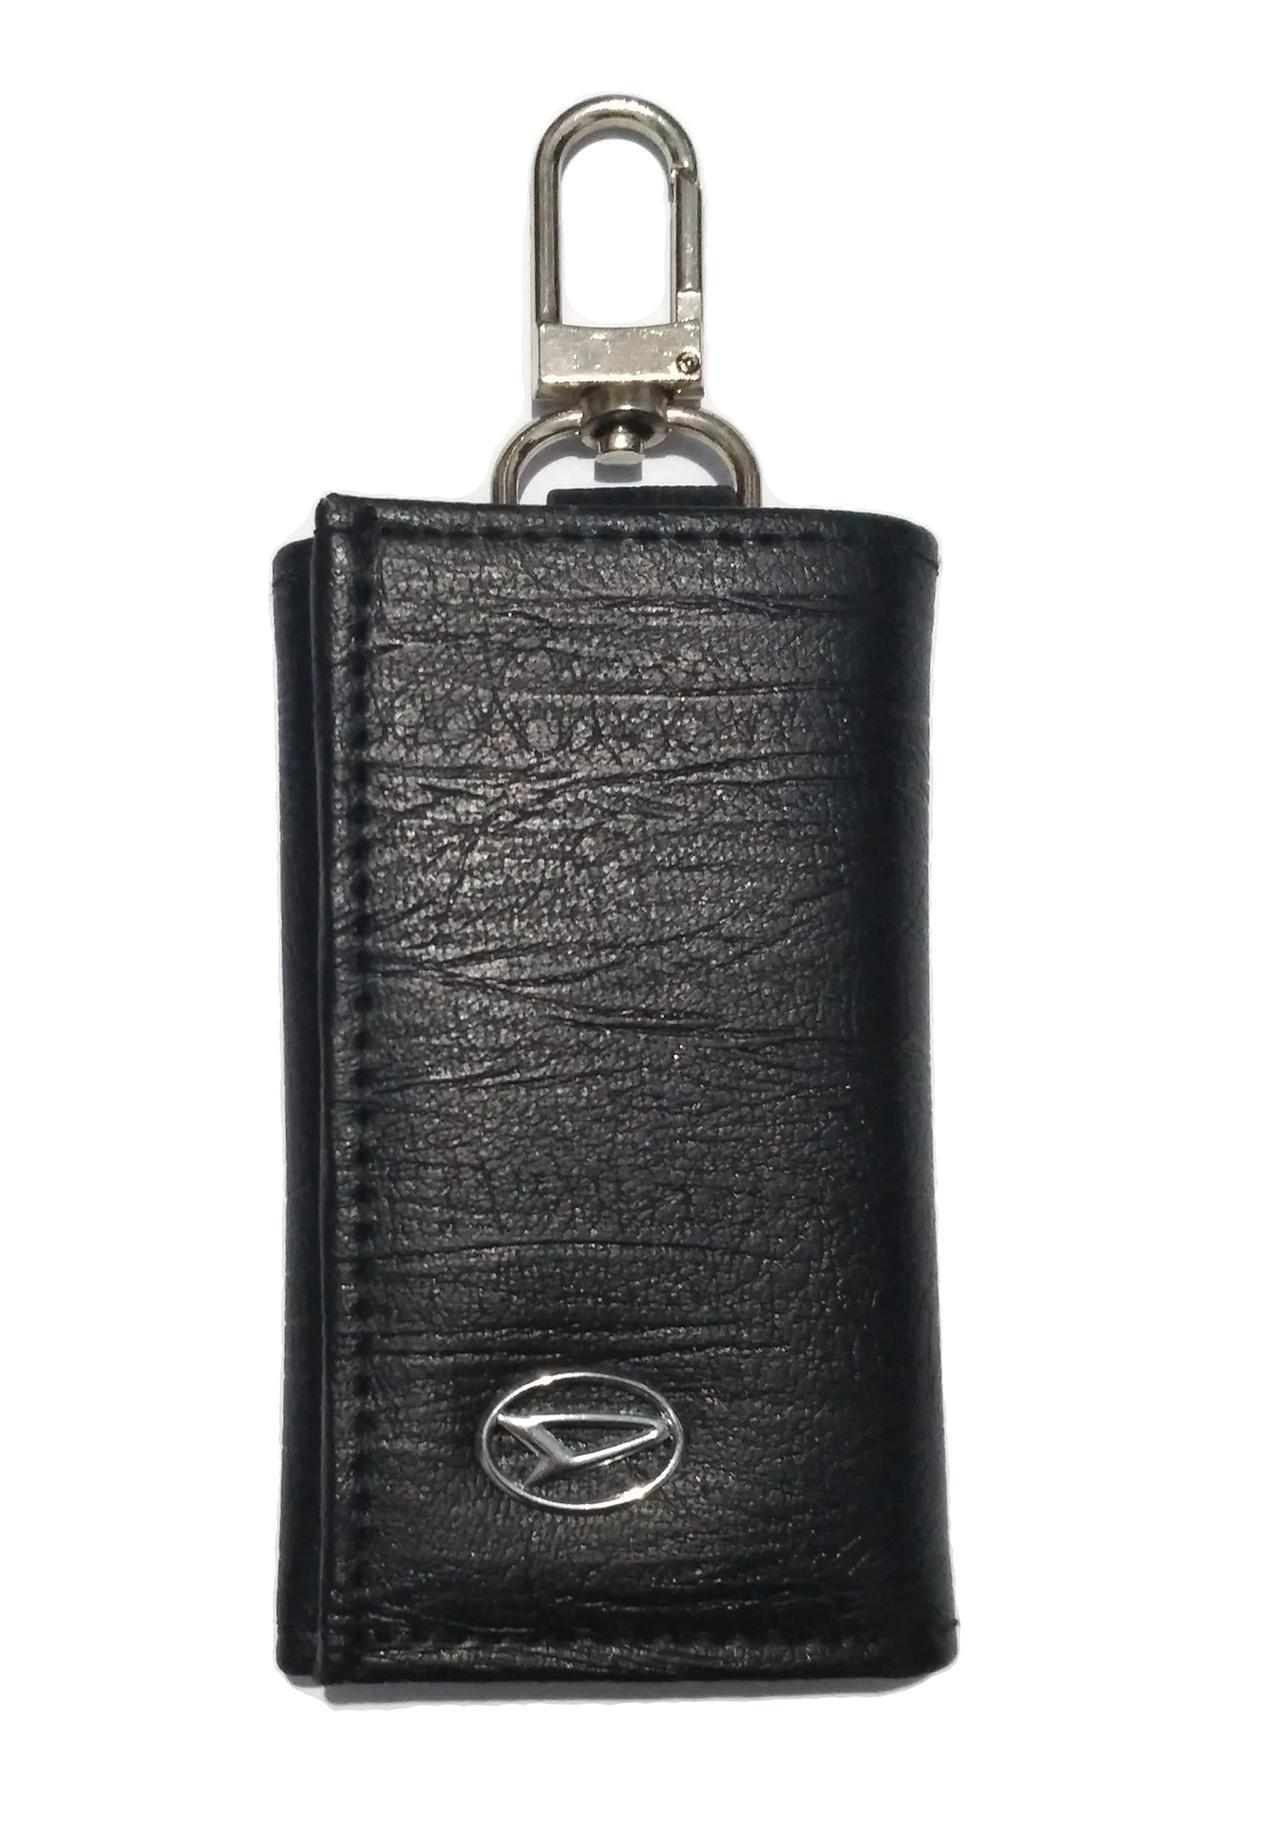 Dompet STNK - Gantungan Kunci Mobil DAIHATSU Motif serat halus Bahan  berkualitas - Hitam b91415e6d1